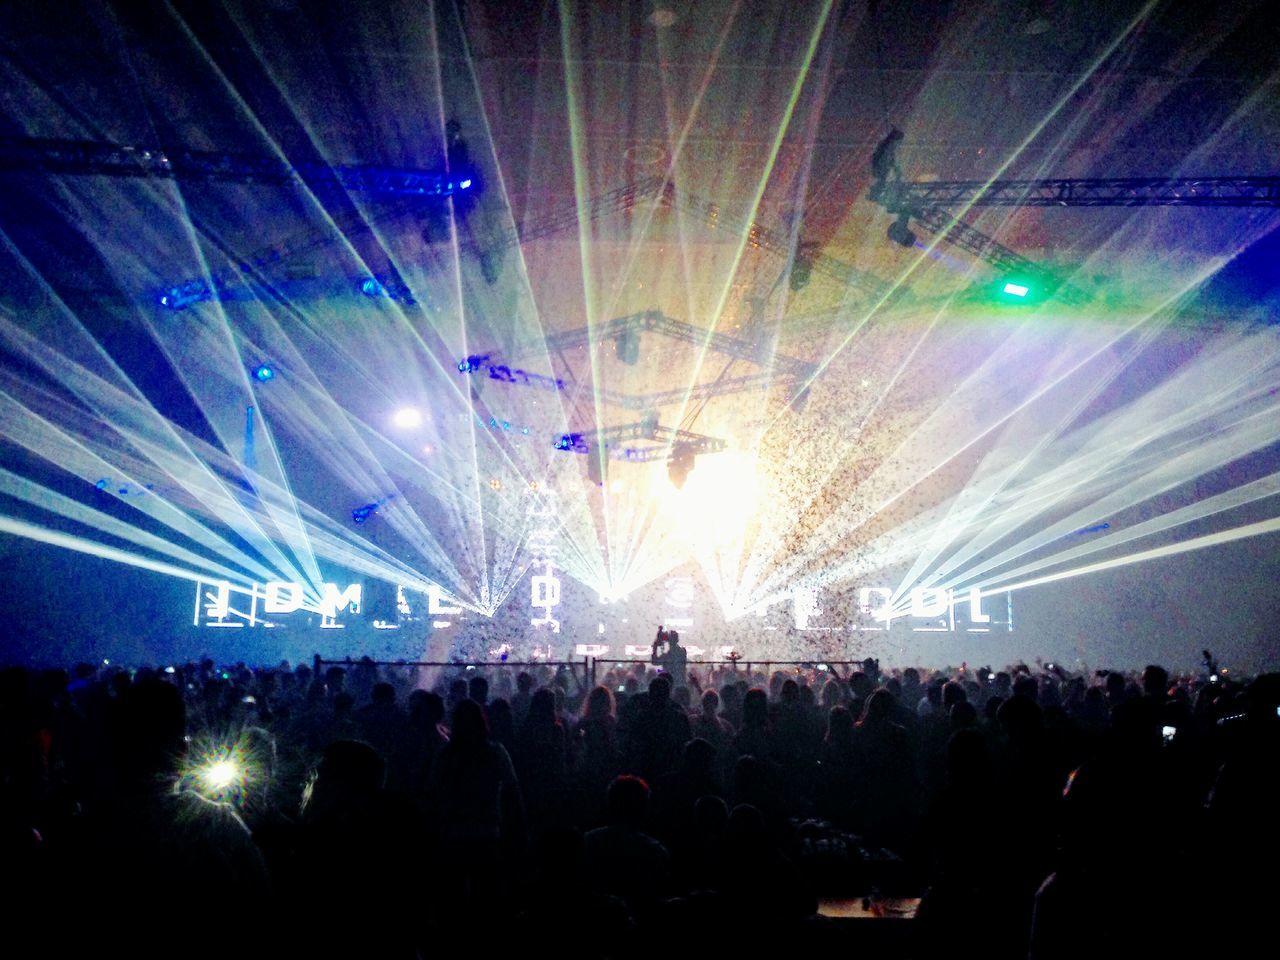 Bonusz Bonuszfesztival Hungexpo Budapest Lasershow Lasershow Party Techno First Eyeem Photo